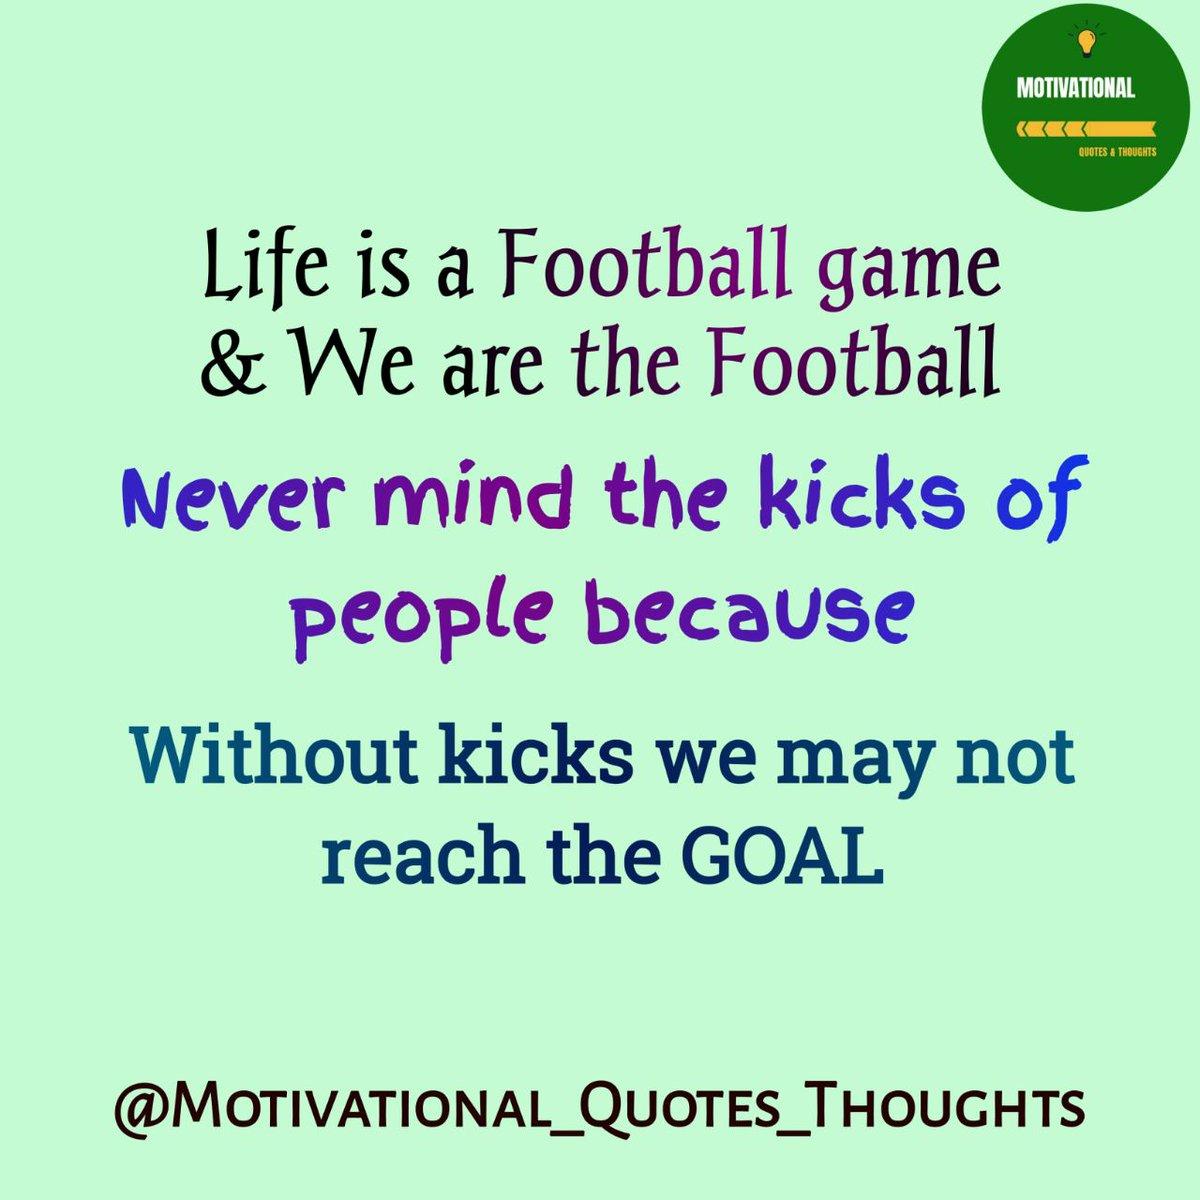 #LifeStories #SuccessfulTips4Students #motivation #quoteoftheday 💯